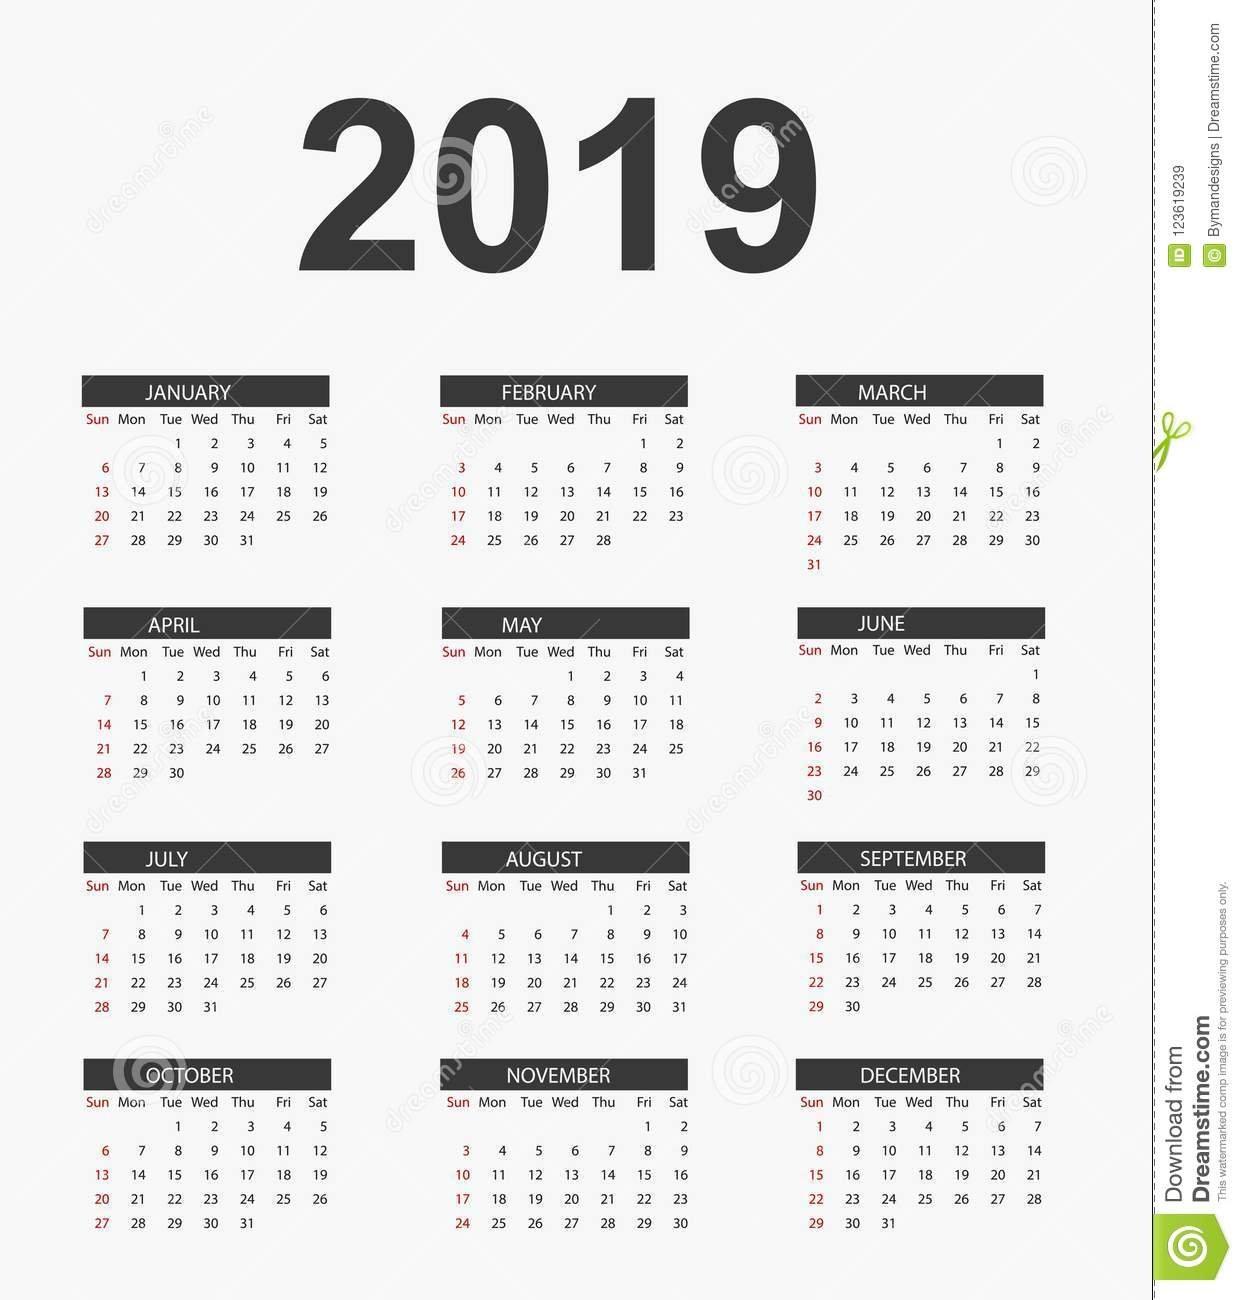 Simple Calendar 2019 .vector Files Stock Vector – Illustration Of Calendar 2019 Vector